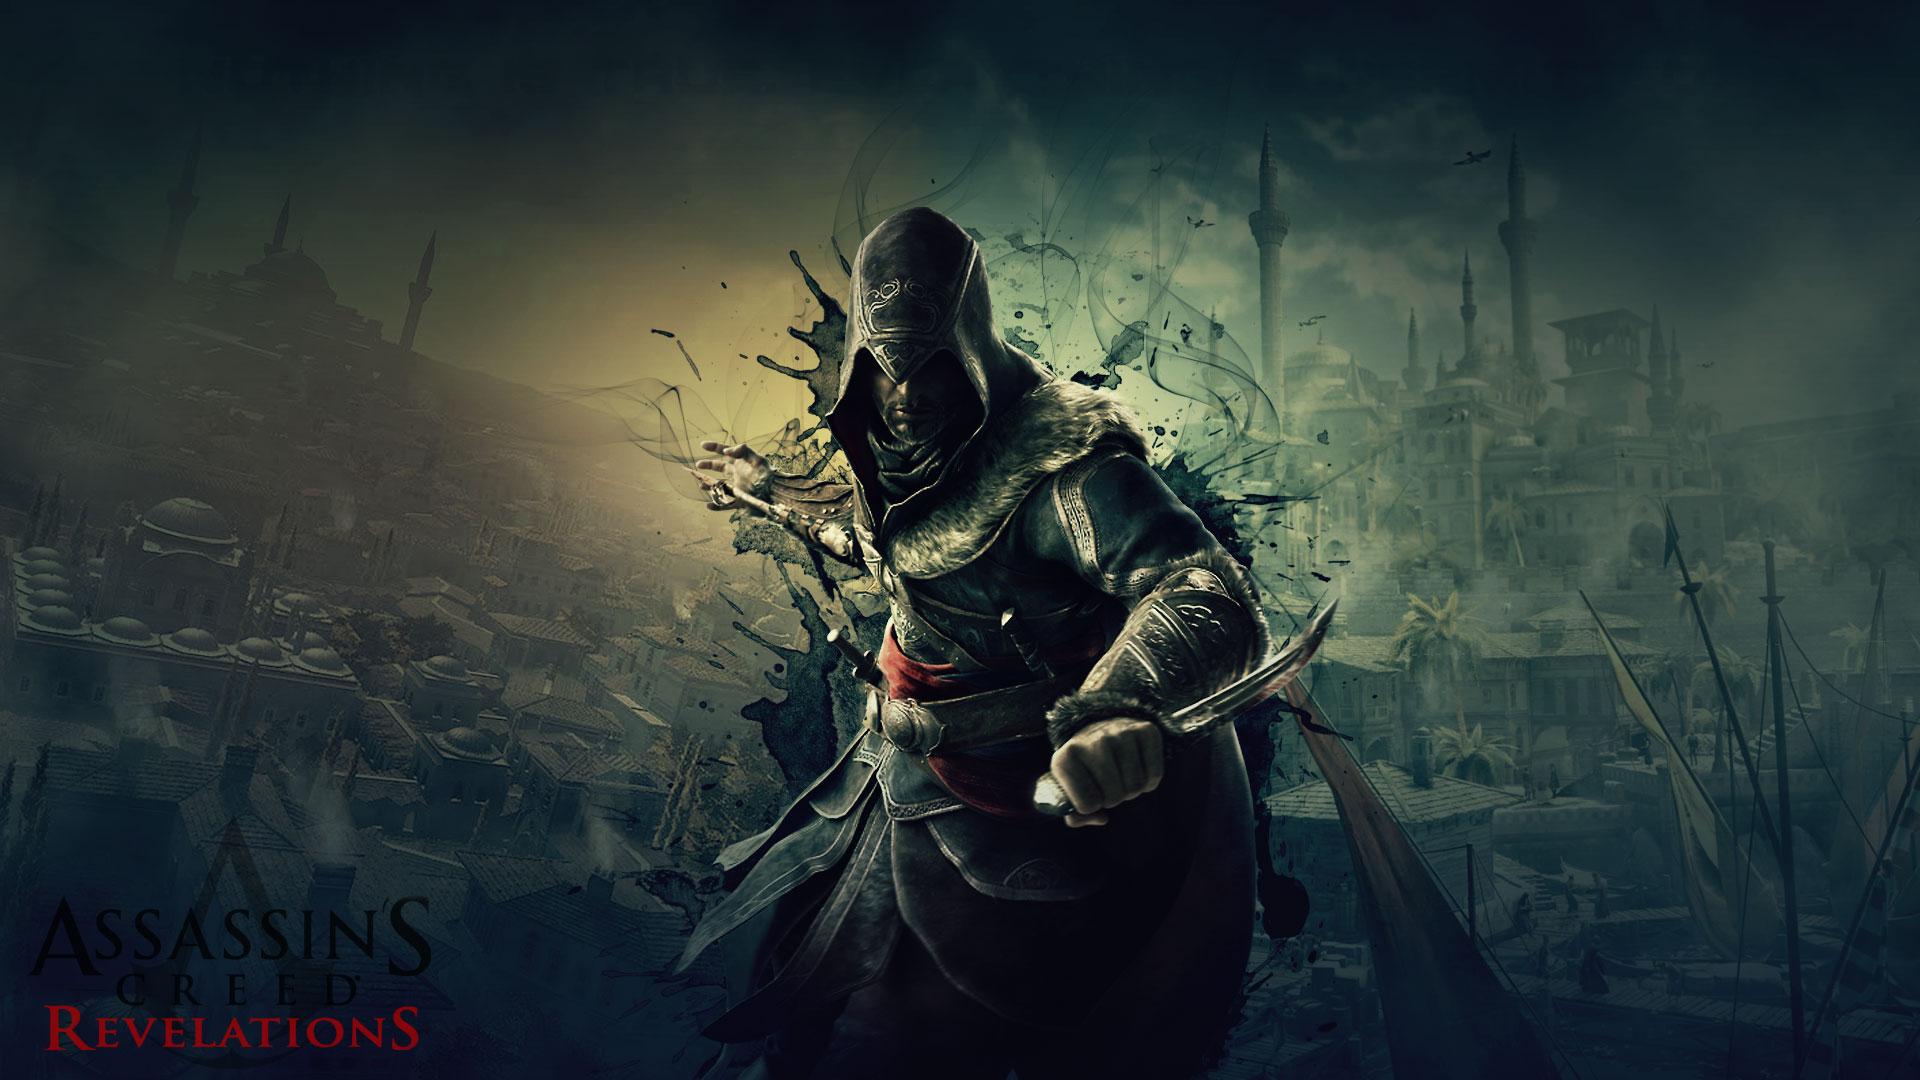 Assassin s Creed Revelations the assassins 32112879 1920 1080jpg 1920x1080